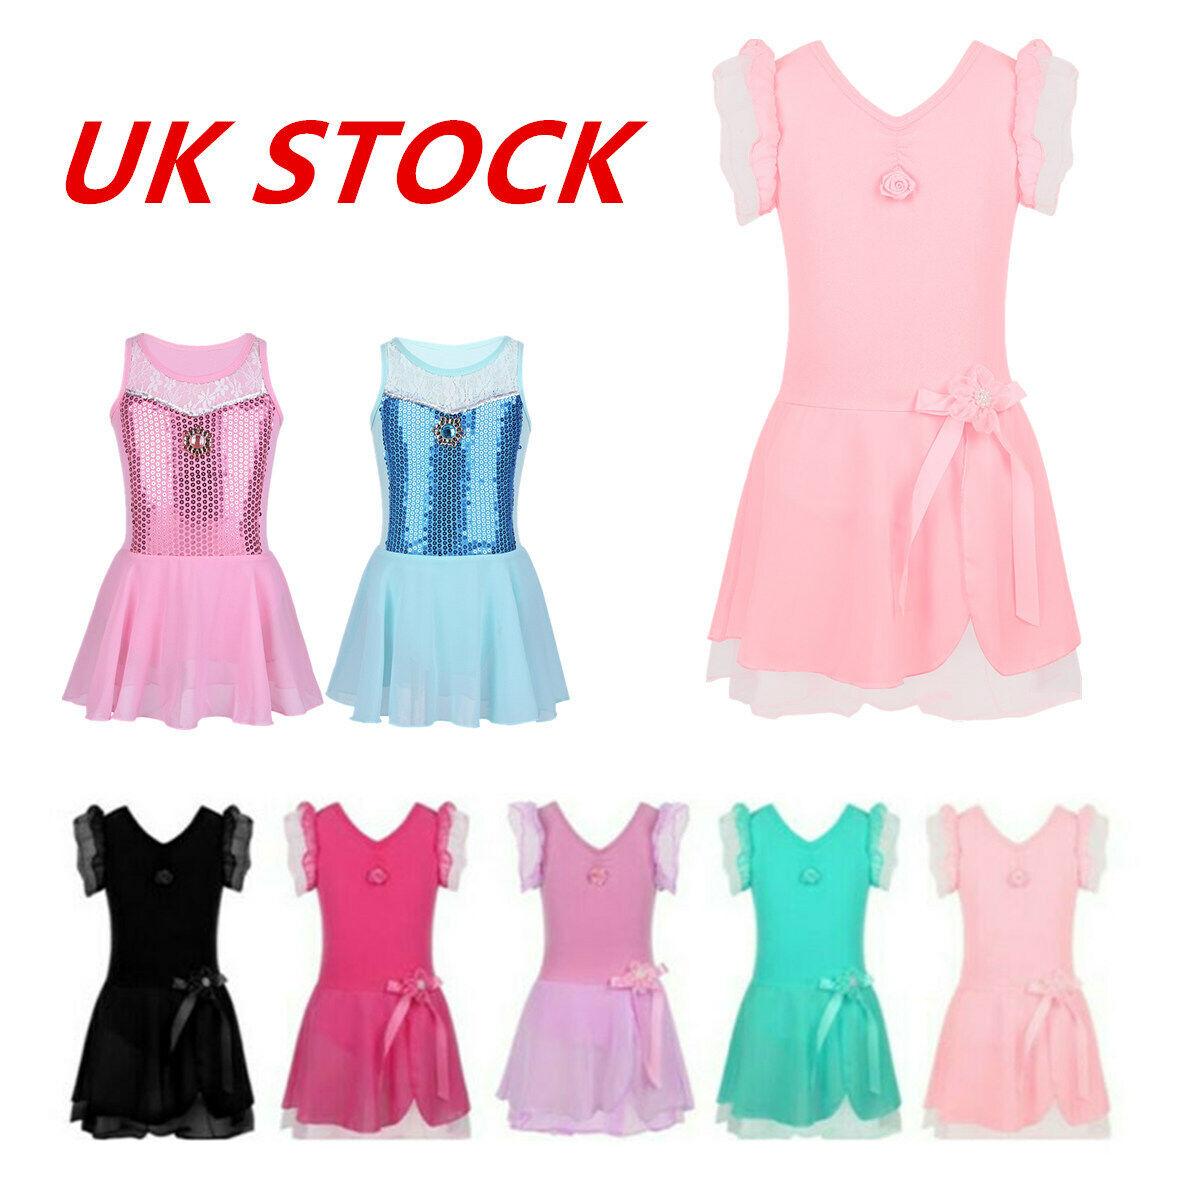 UK Kids Girls Ballet Dress Dance Sequins Gymnastic Tutu Princess Dress Dancewear